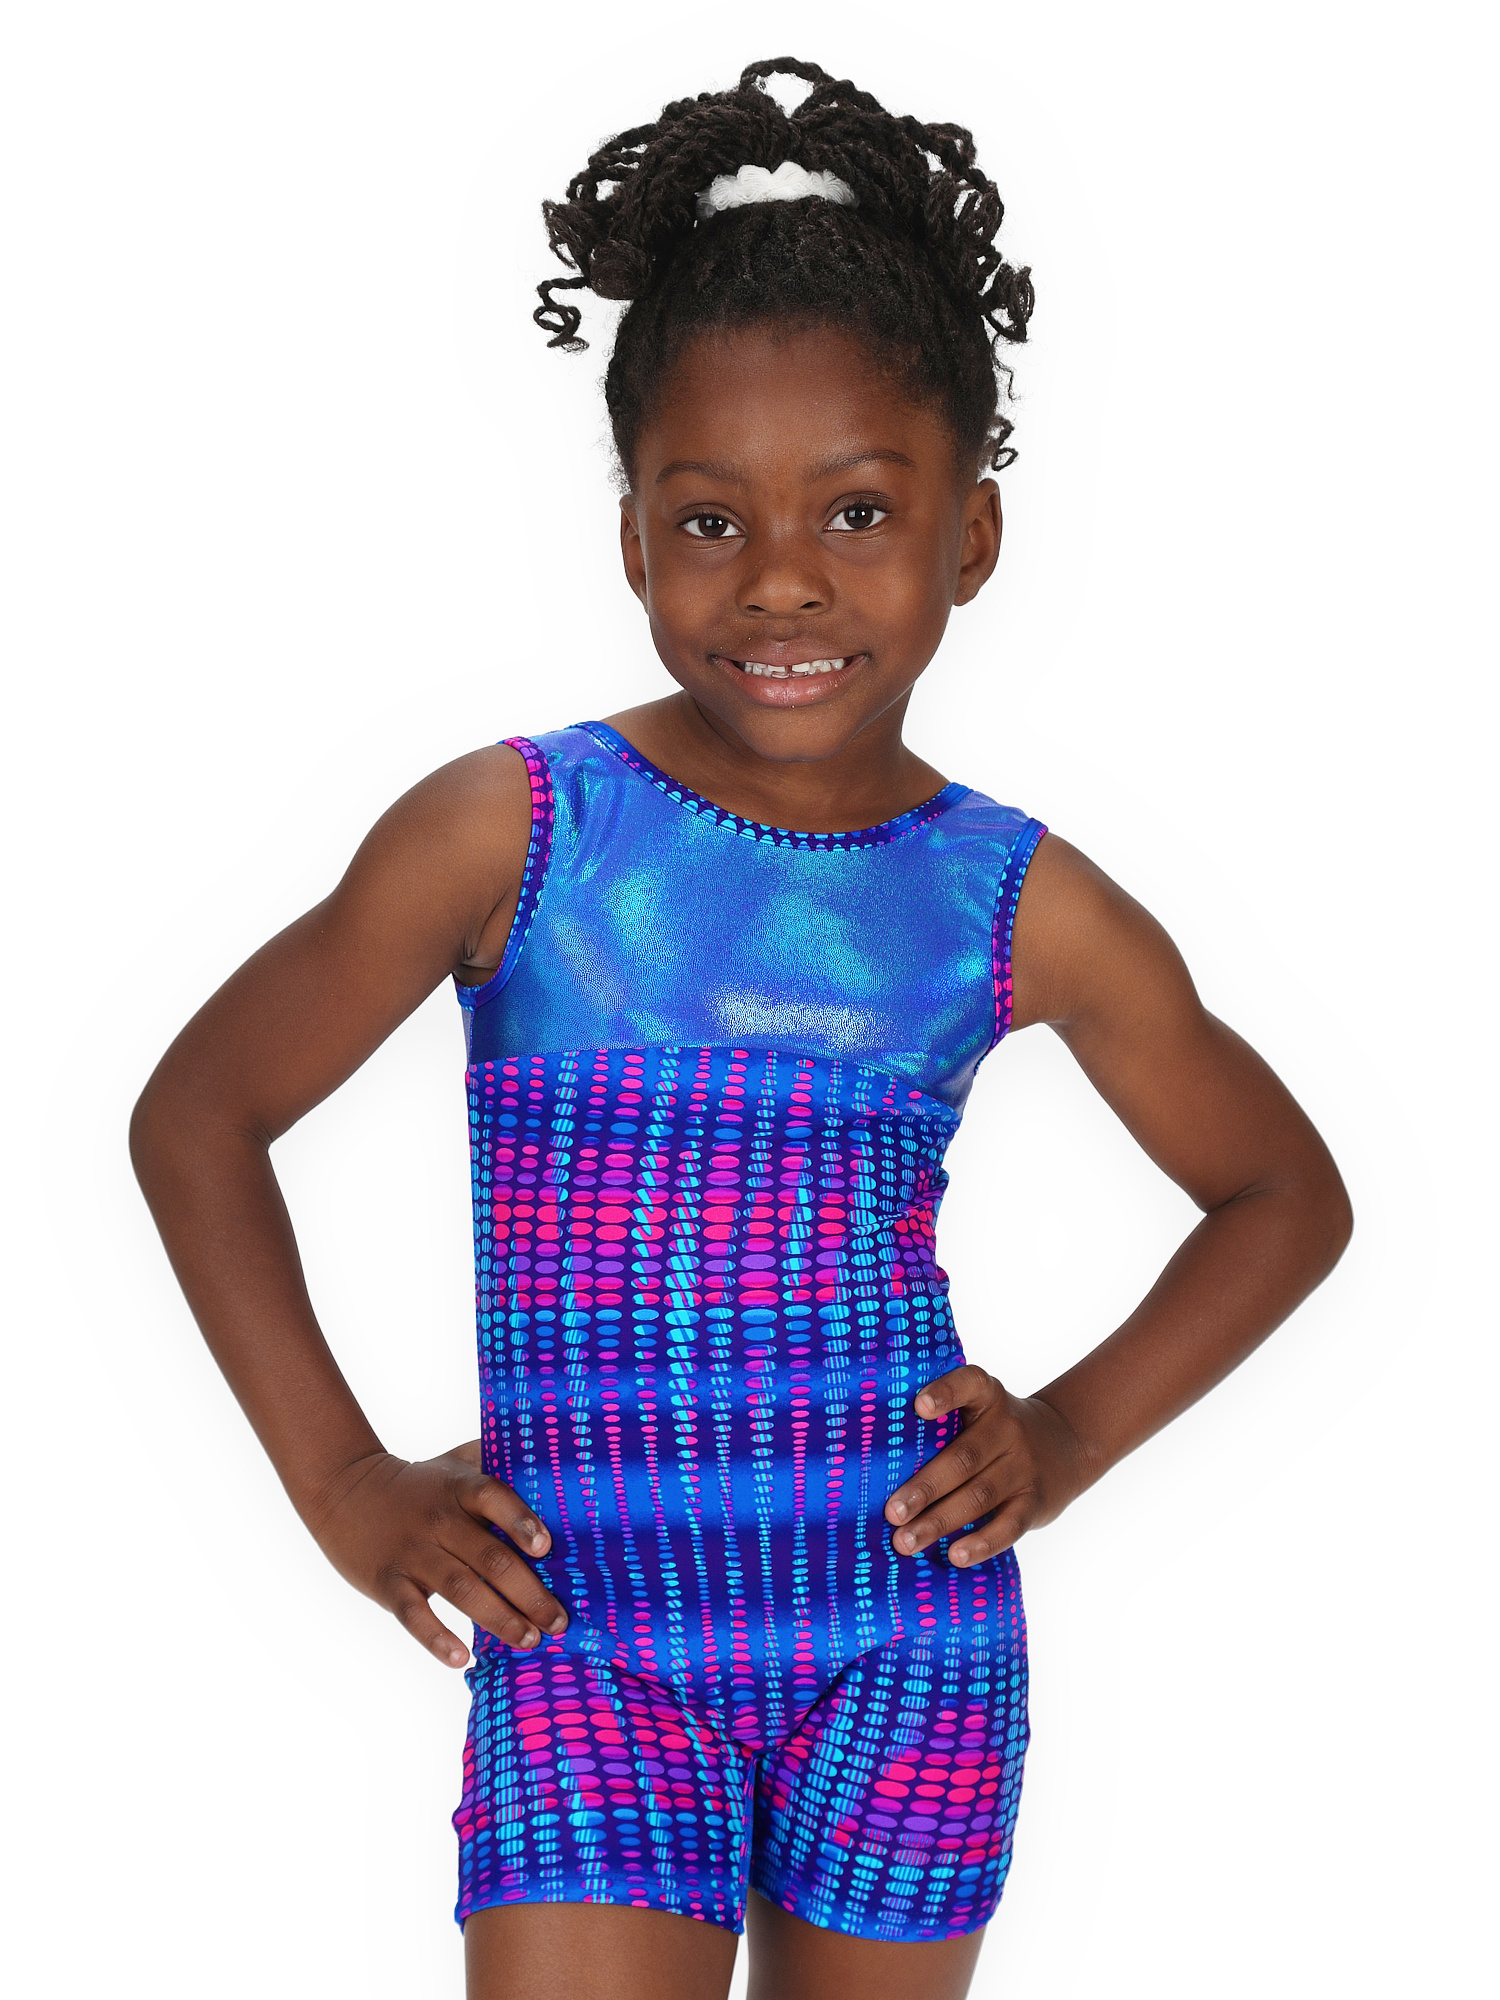 Gymnastics Biketard for Girls - Electric Pulse - Leap Gear - 10 | Adult X-Small